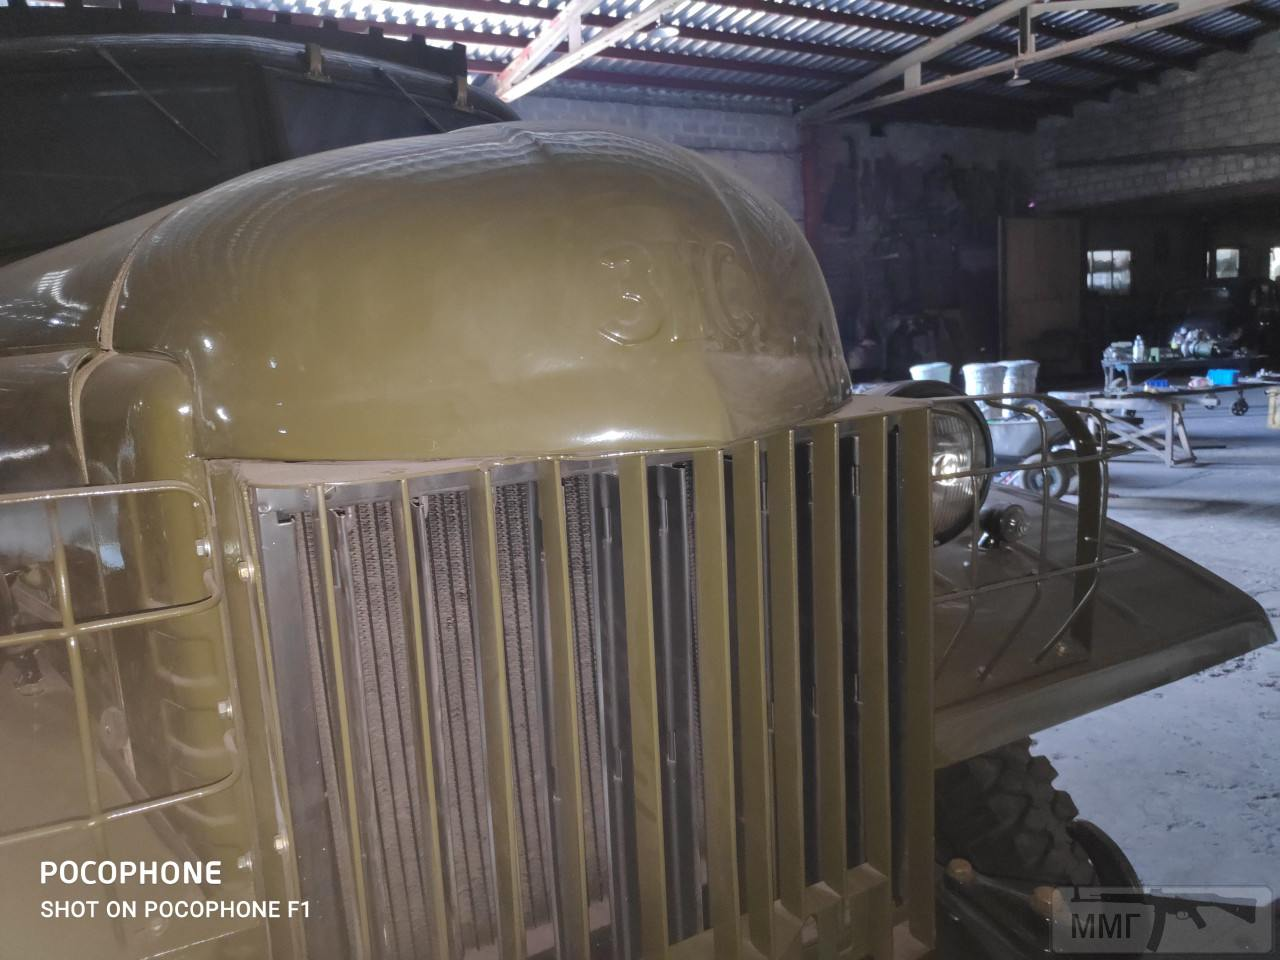 110212 - Музей техники Фаэтон в г. Запорожье